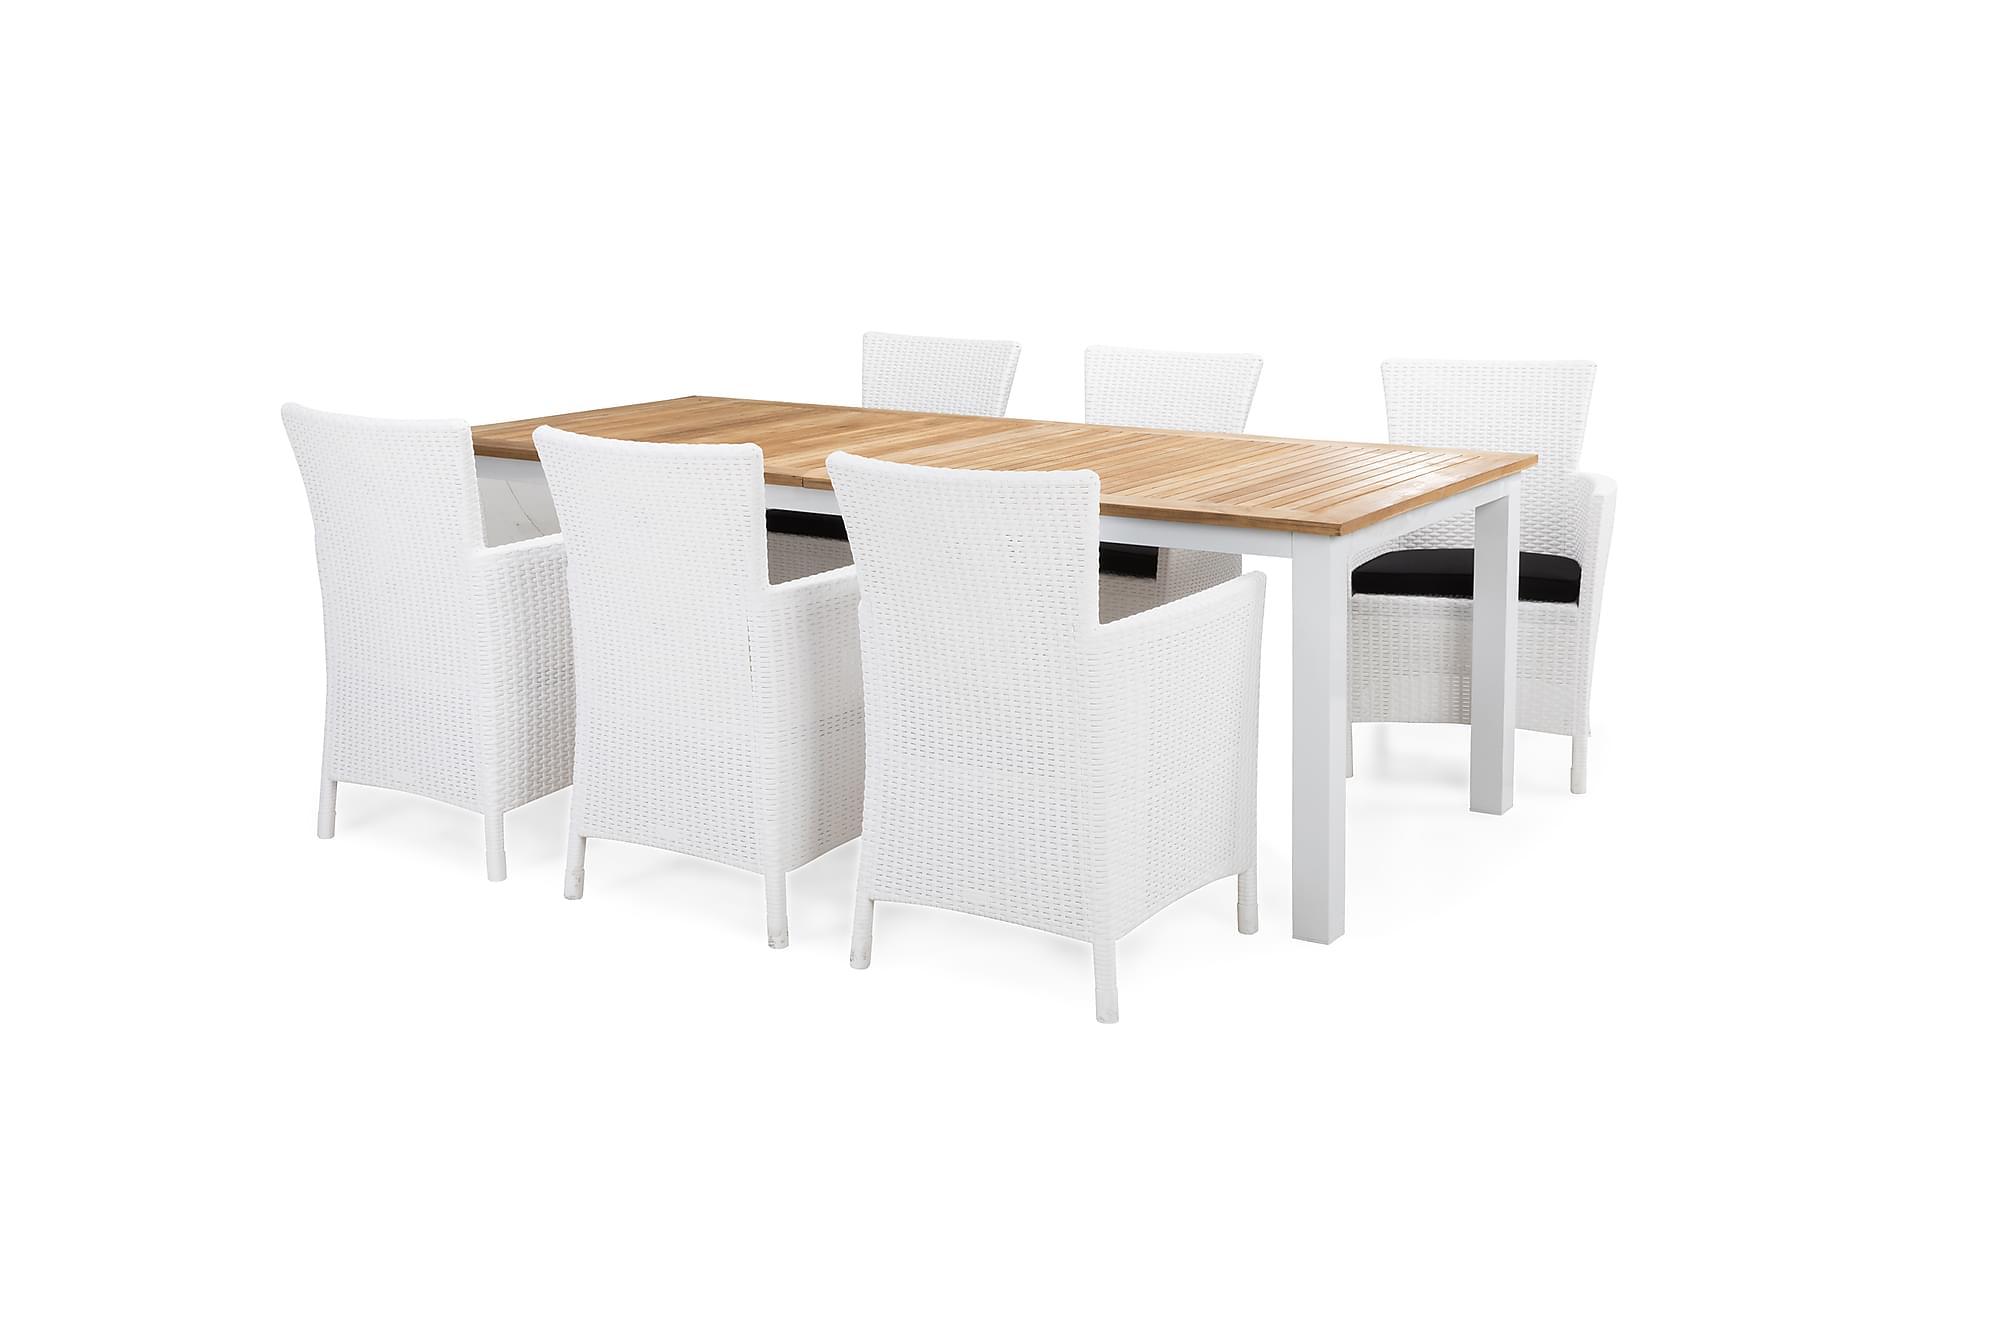 Redding bord 220 + 6 yorkton fåtölj vit/teak + dyna svart